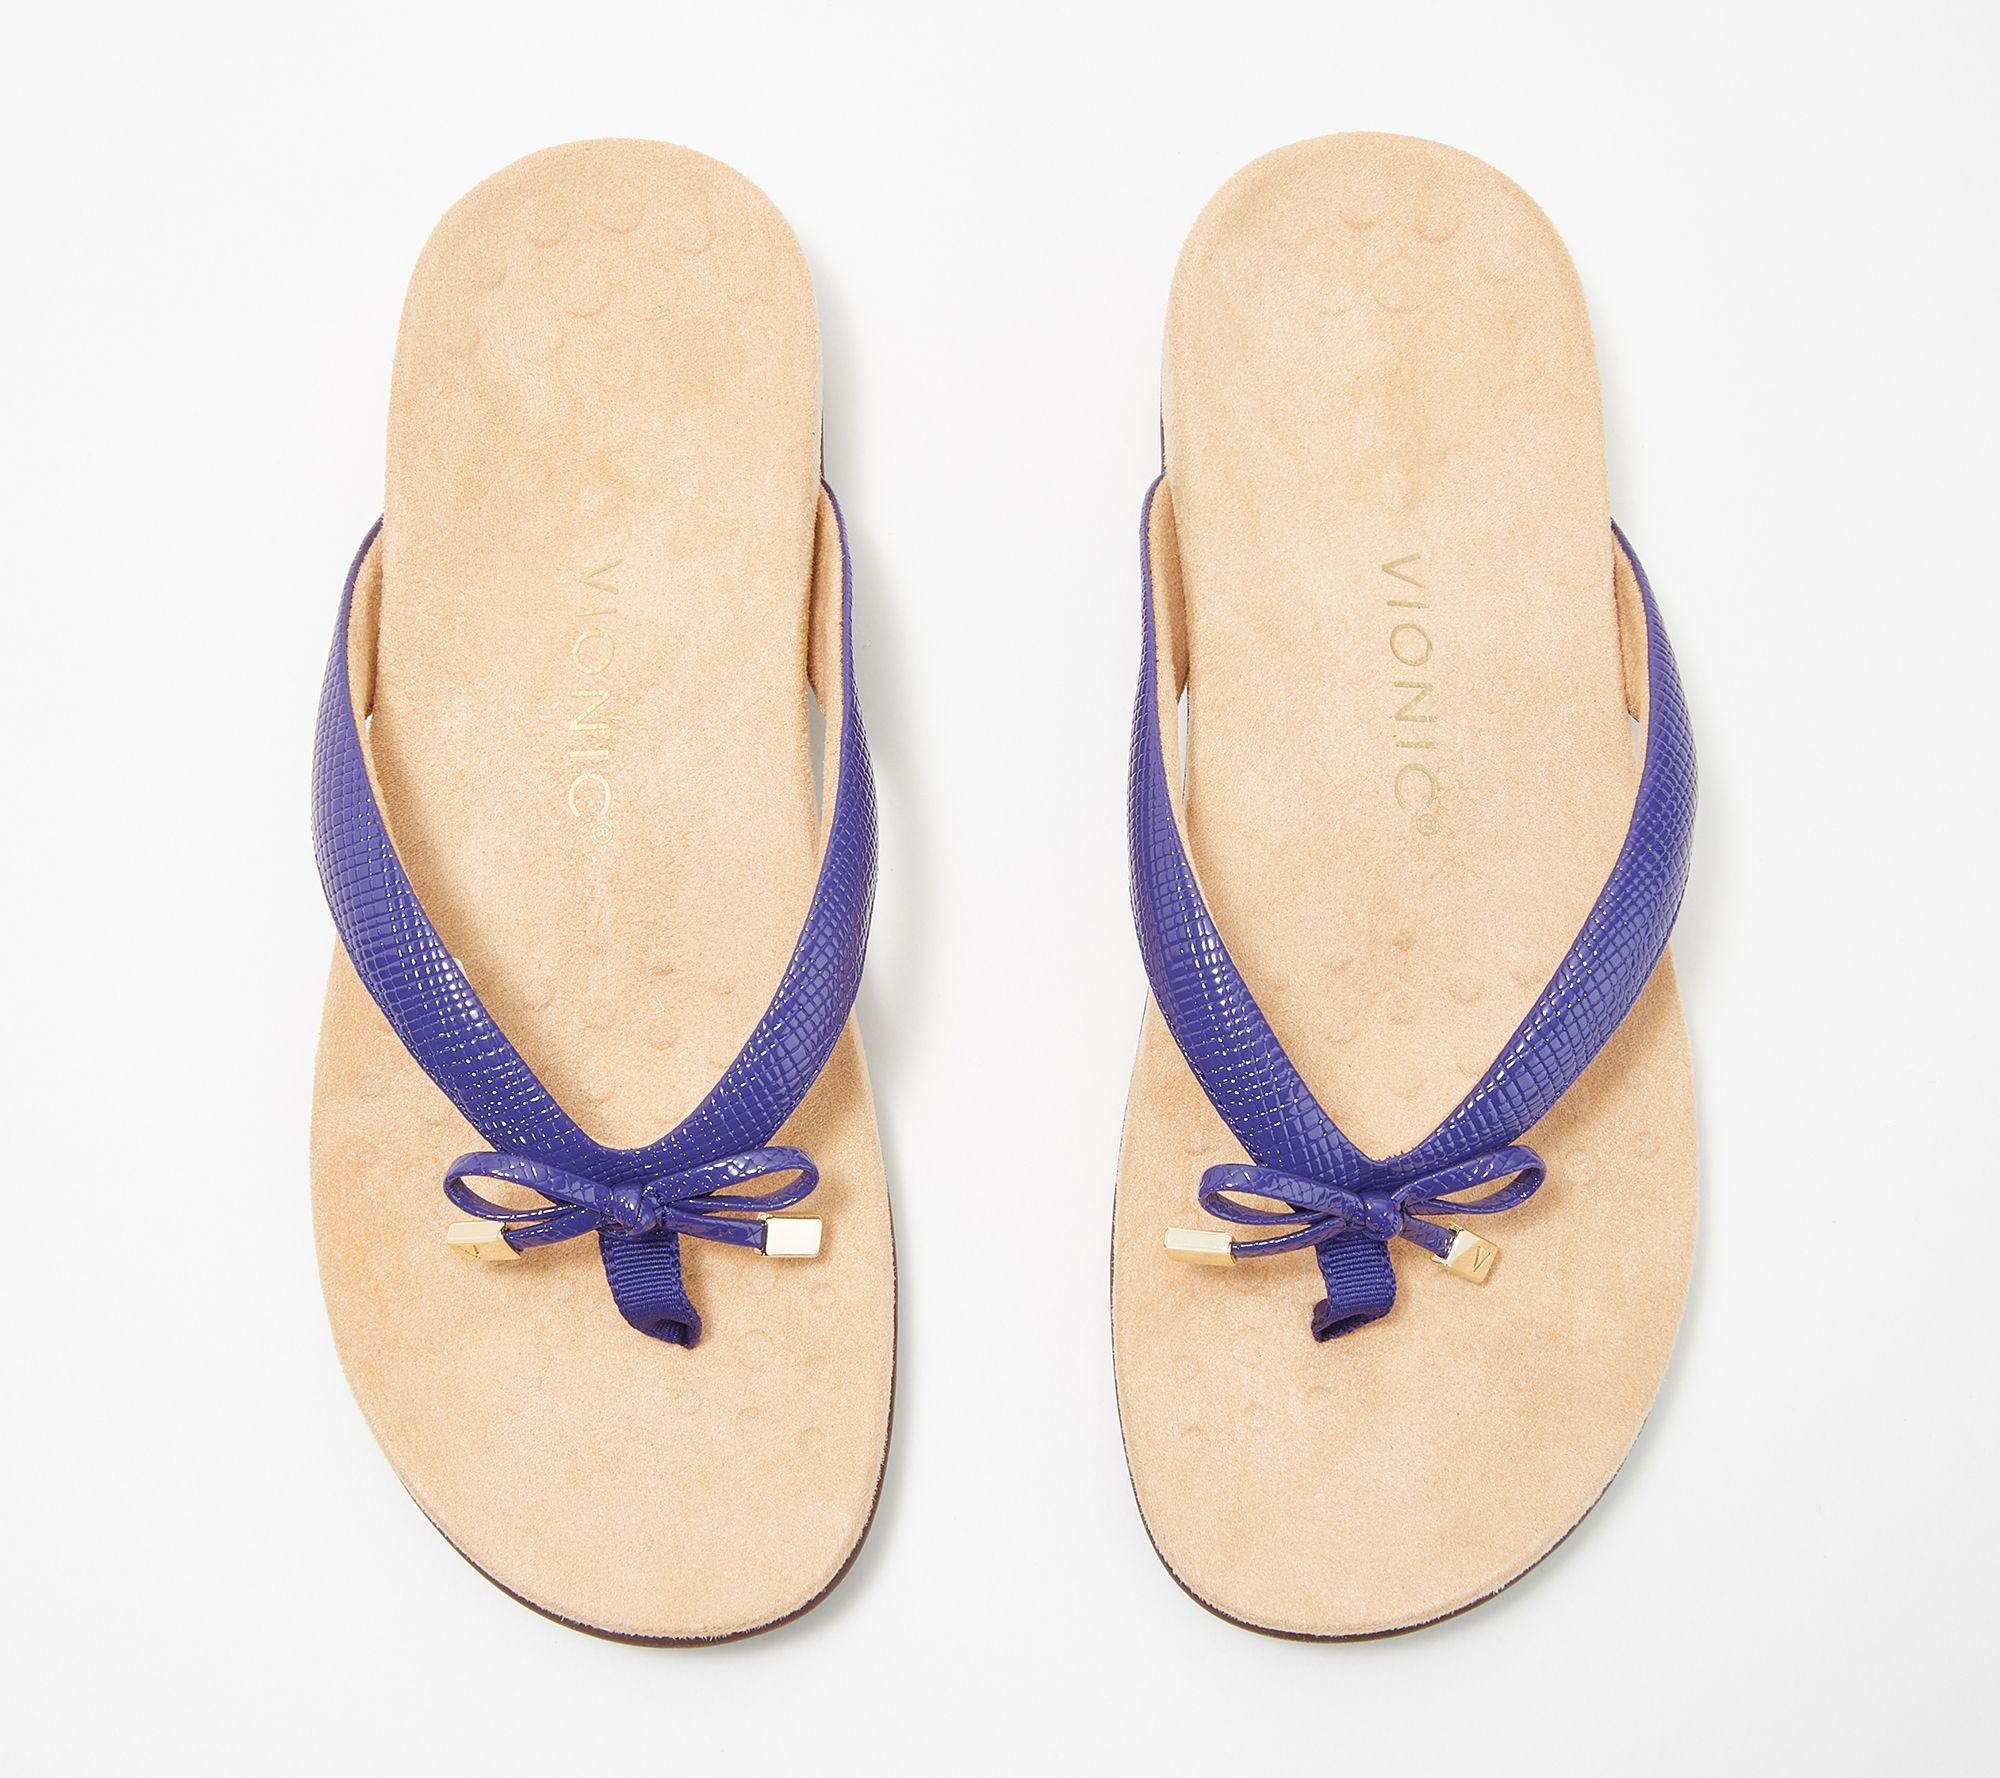 fe7c3a30736 Vionic Thong Sandals w/ Bow Detail - Bella II Lizard — QVC.com